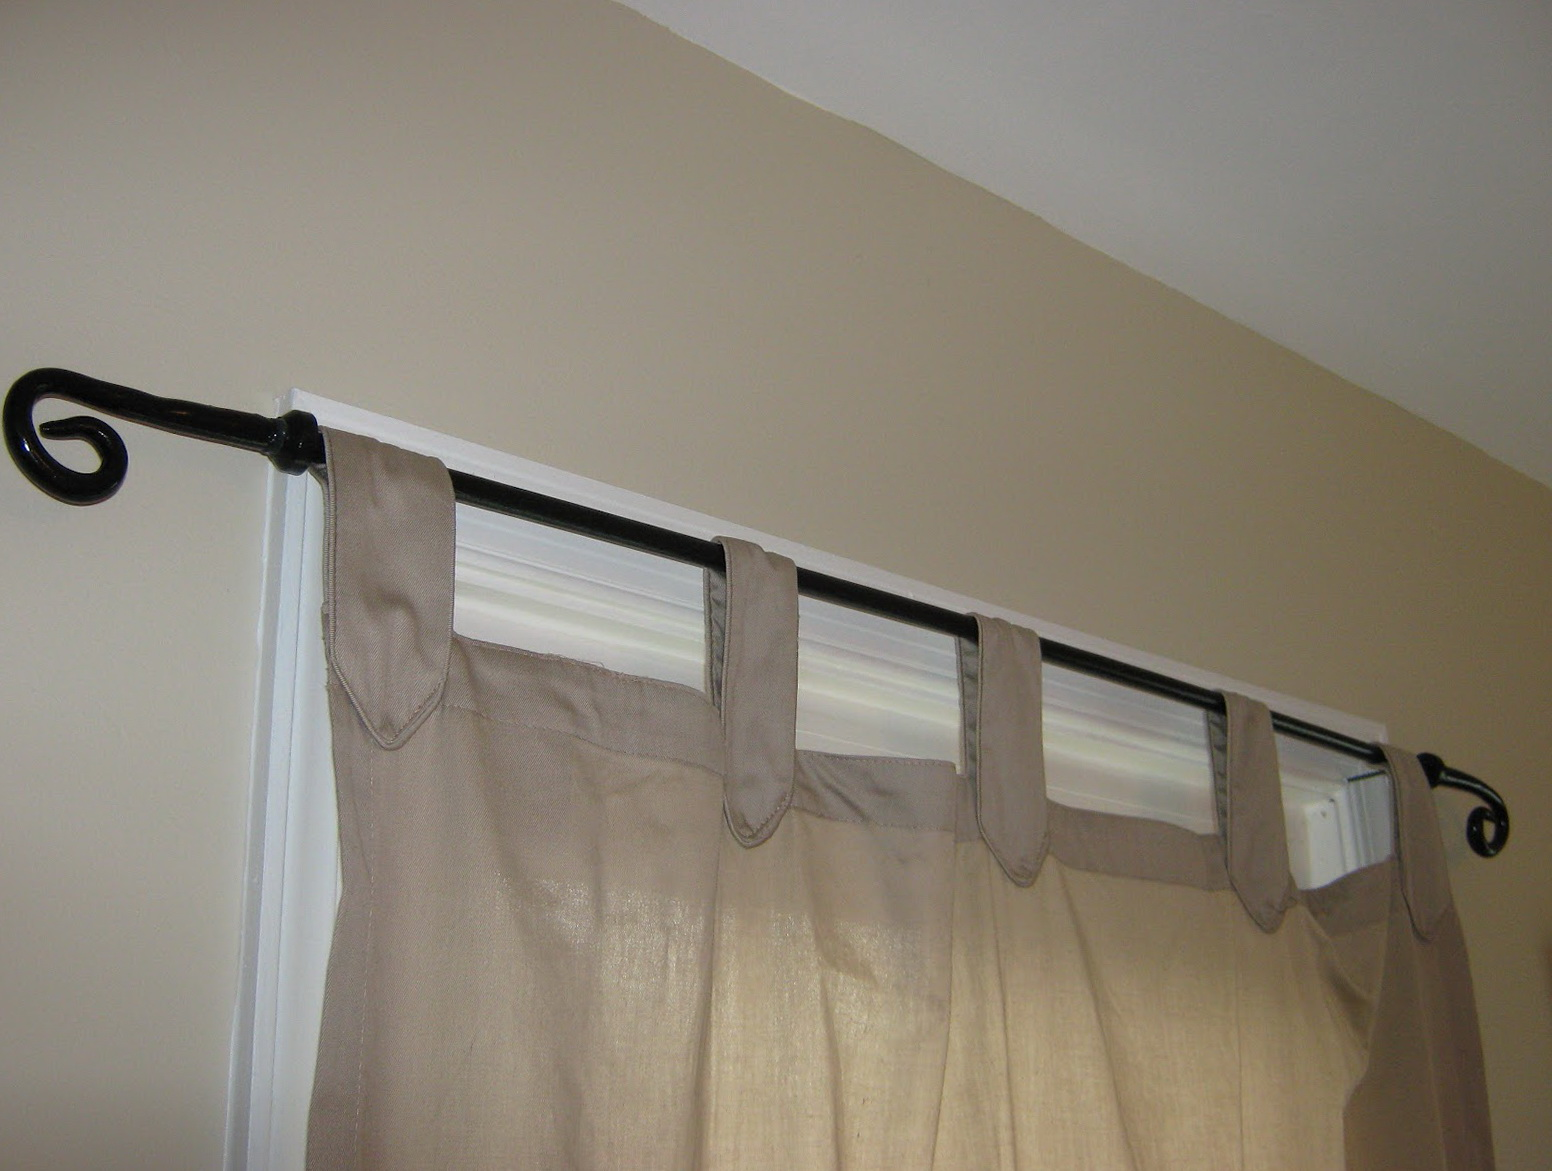 Pottery Barn Curtain Rod Installation